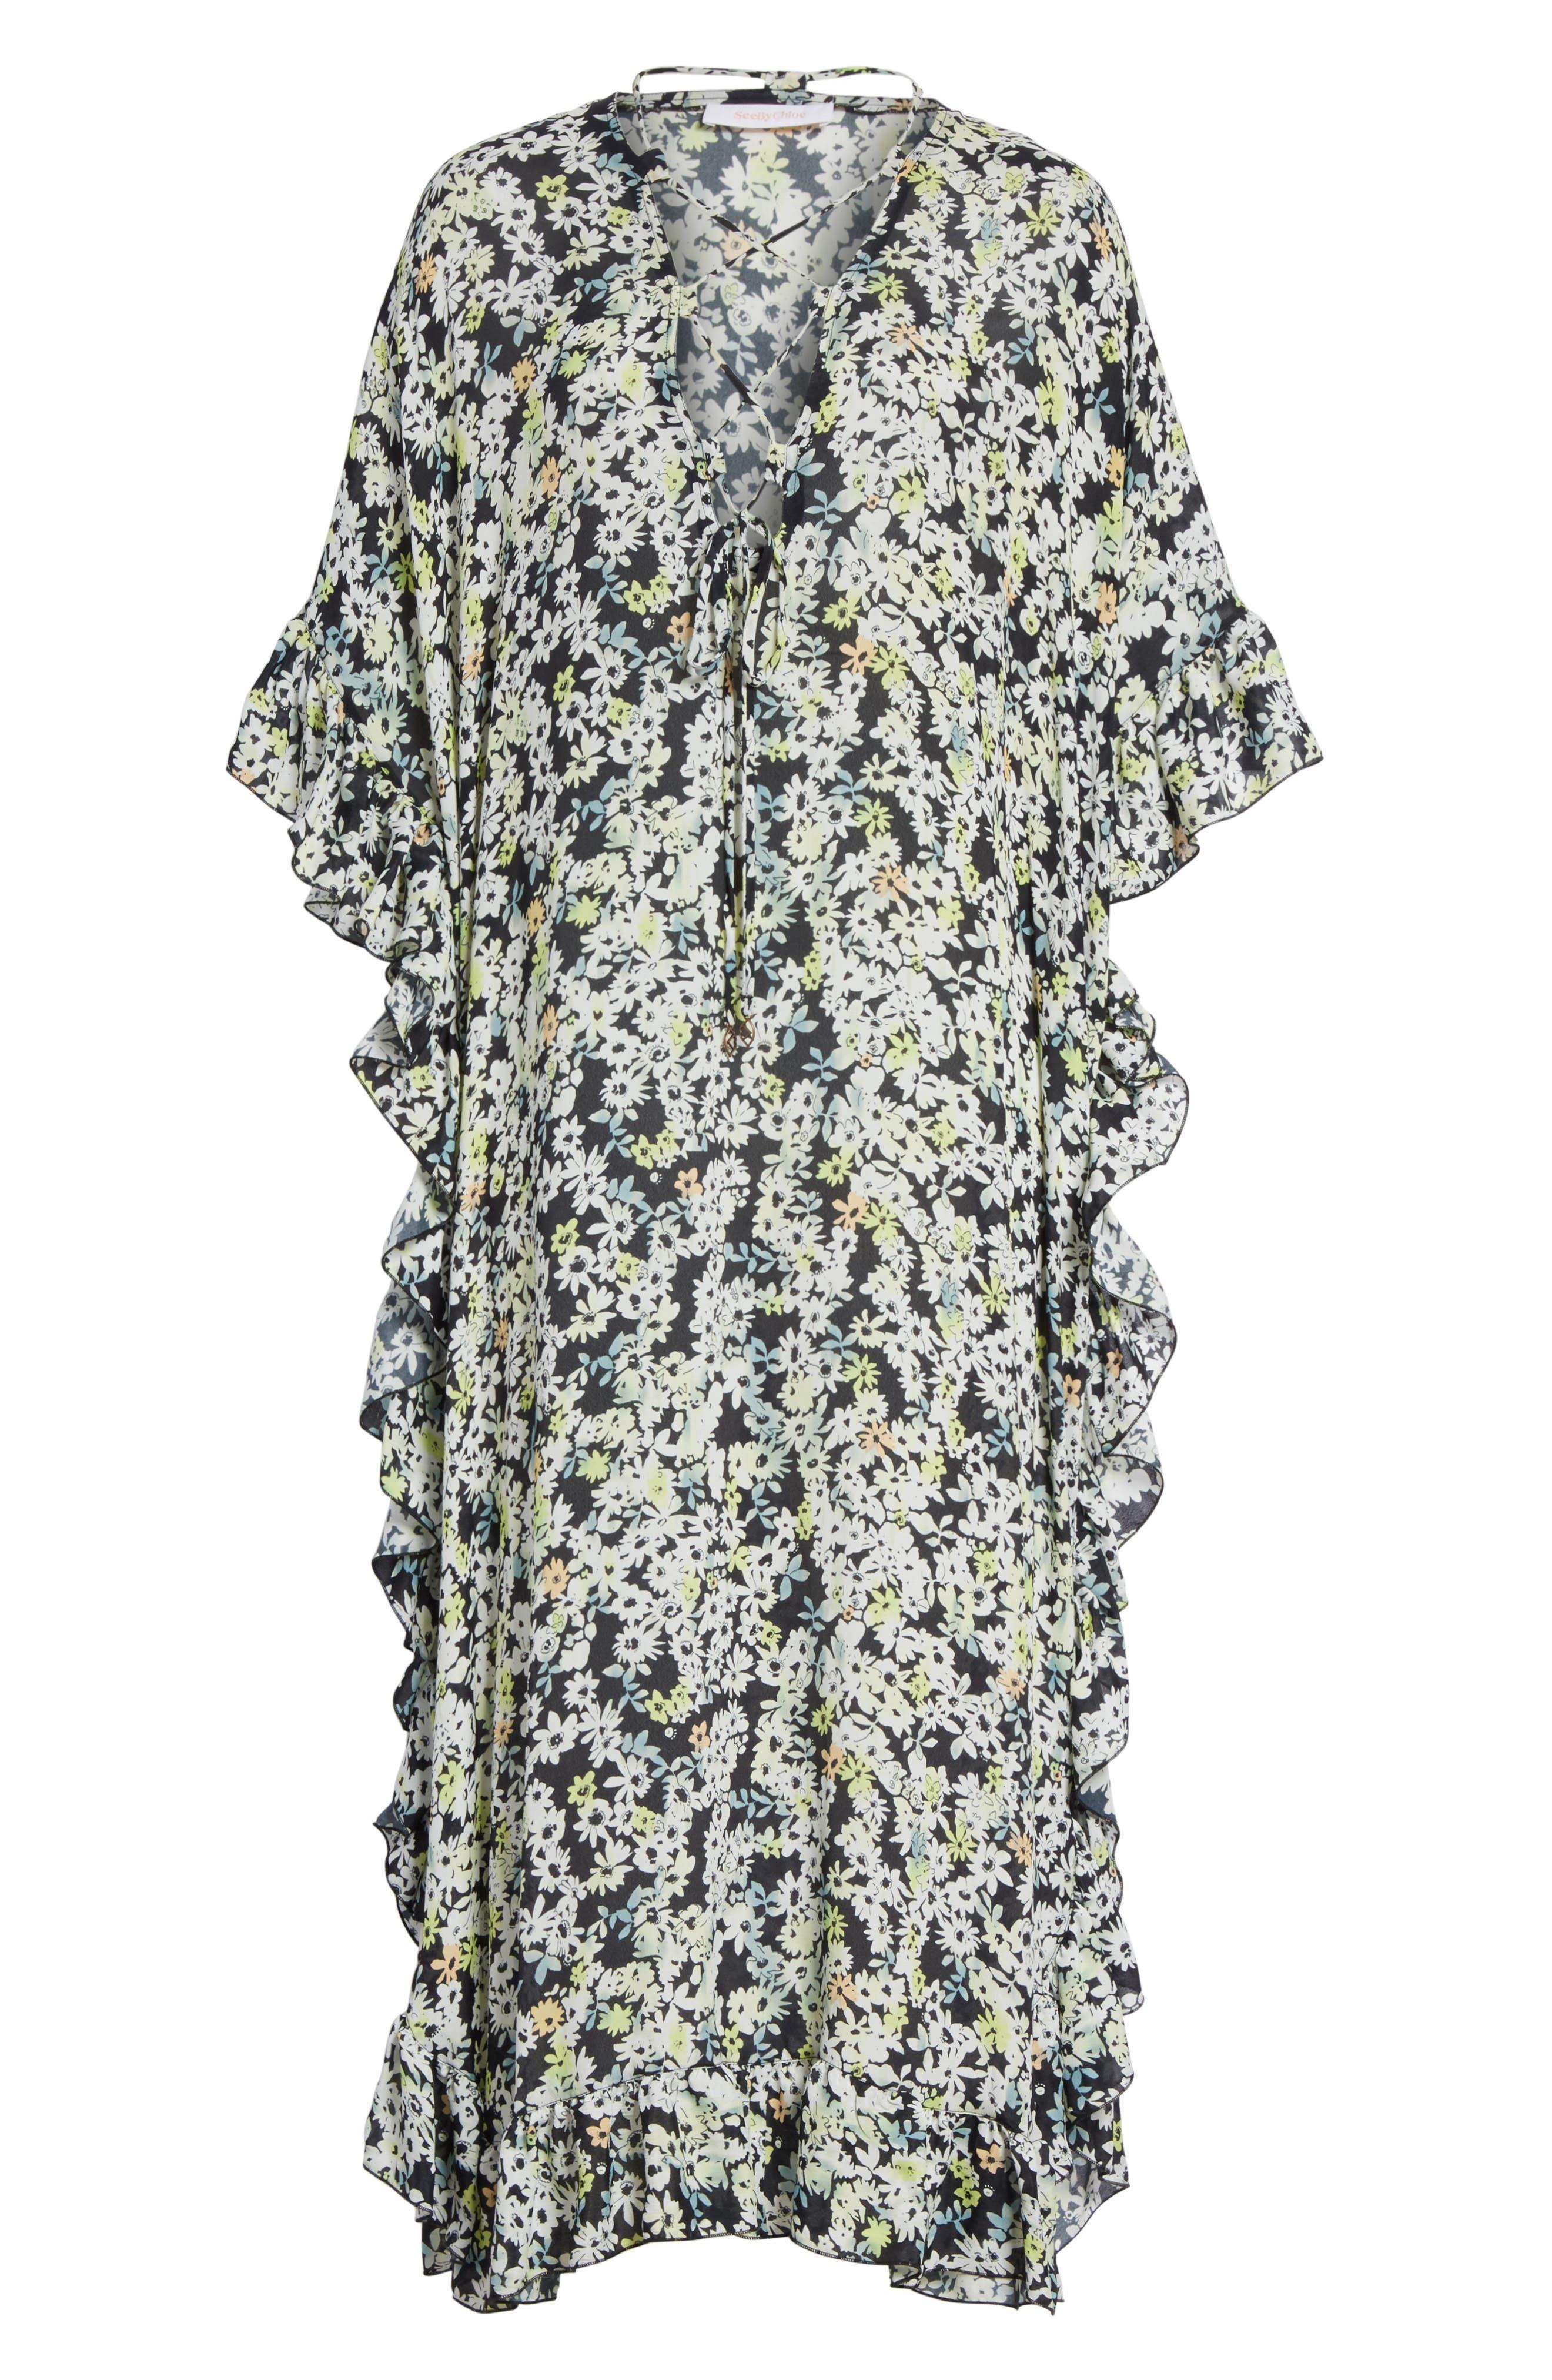 Floral Print Flutter Edge Dress,                             Alternate thumbnail 6, color,                             Multicolor Grey